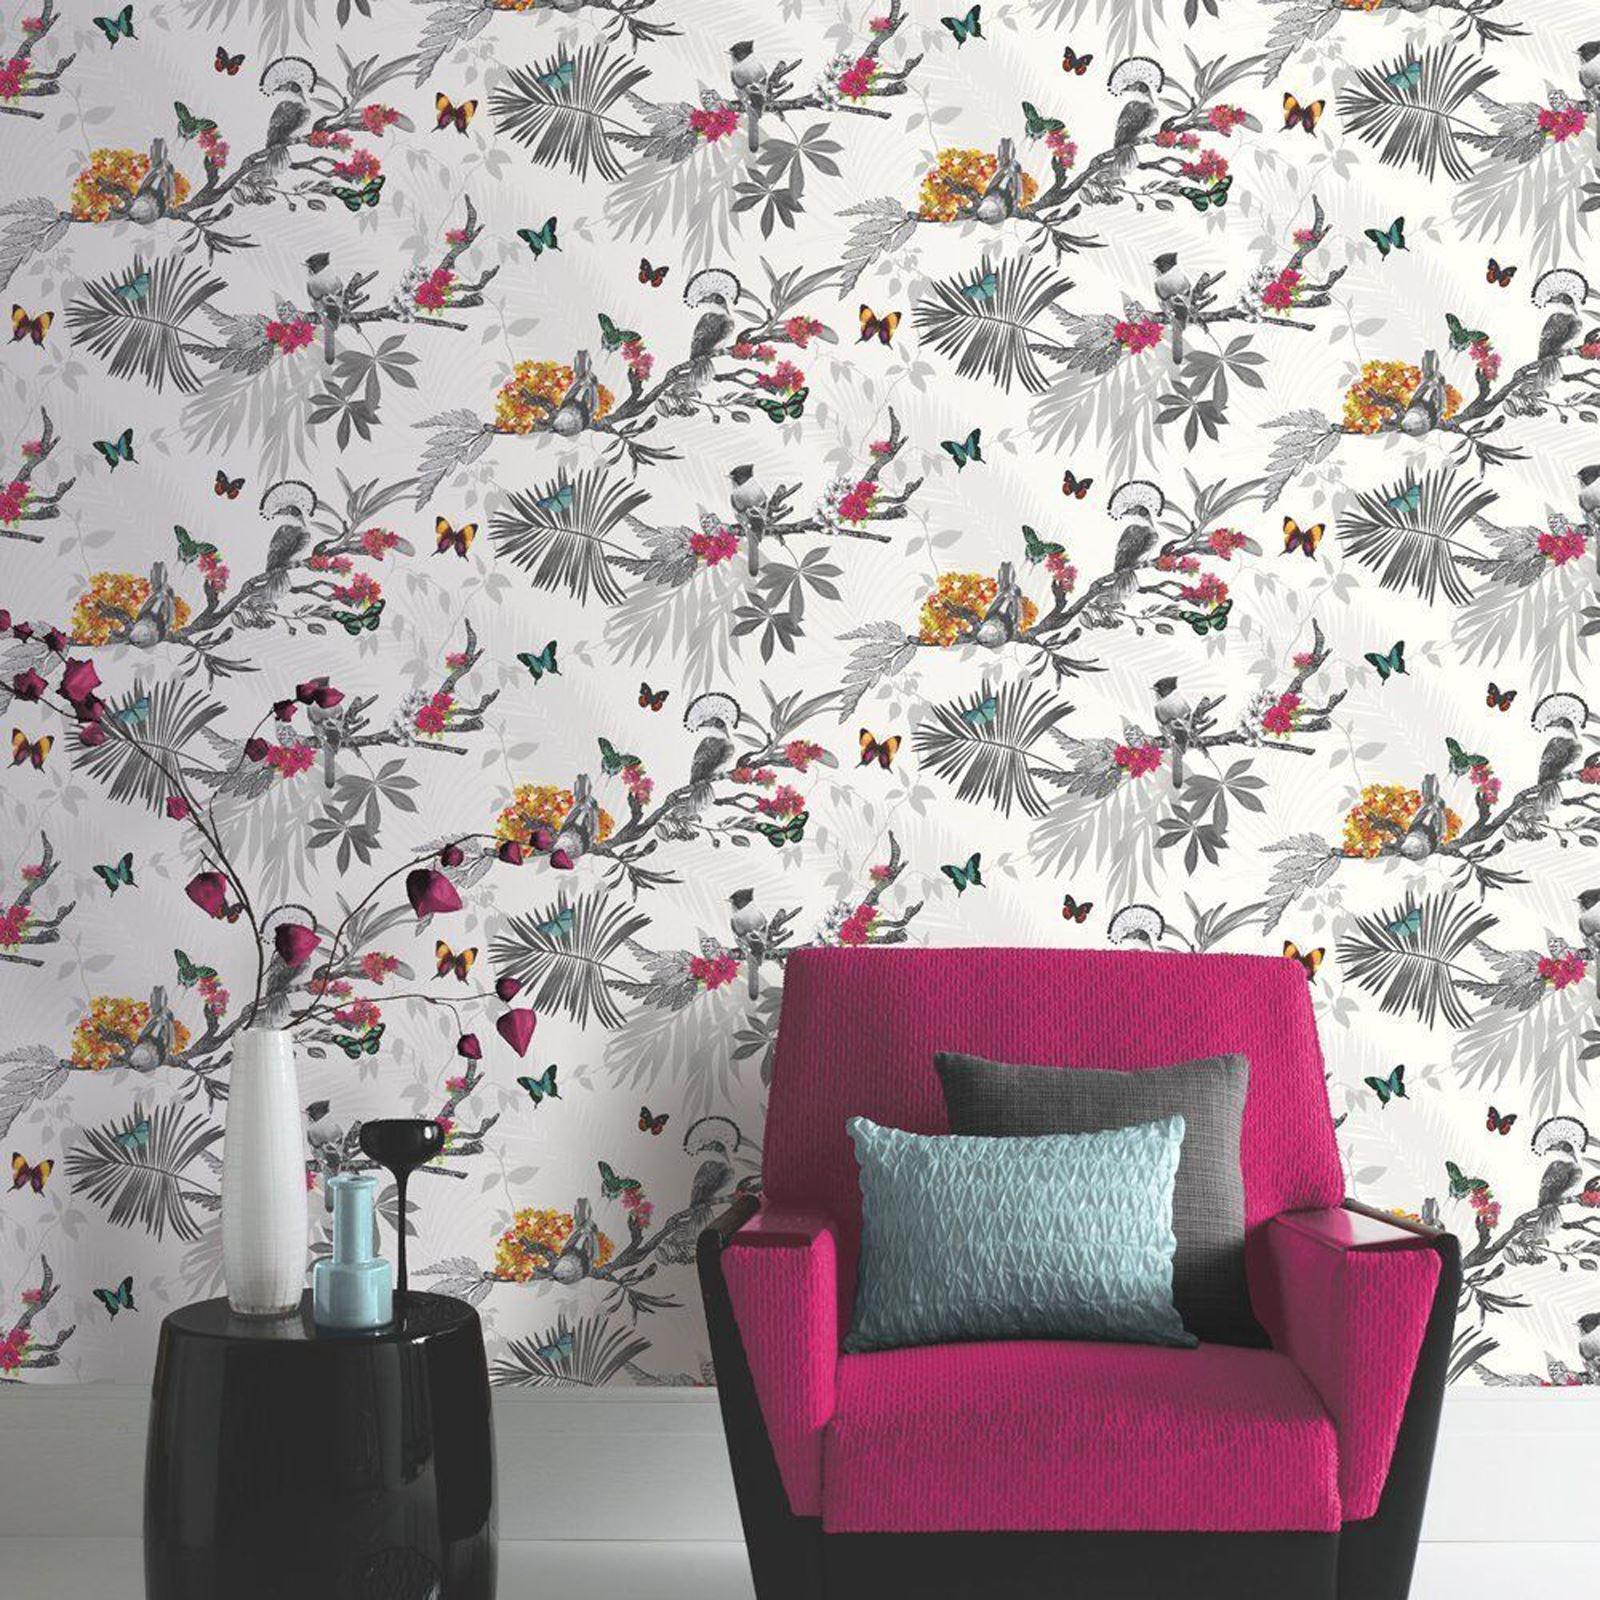 tropical bird wallpaper for walls - photo #43